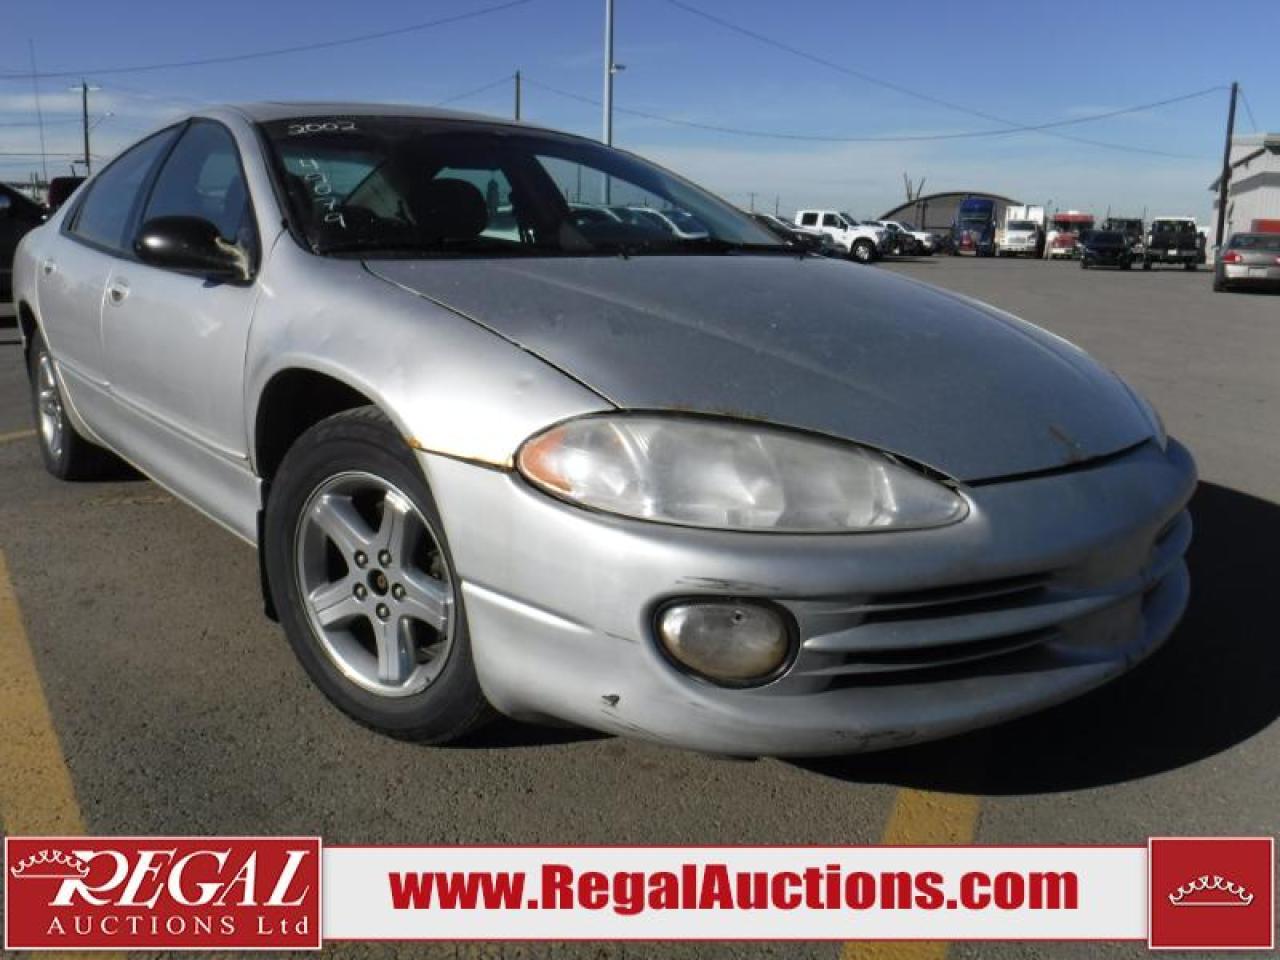 Photo of Silver 2002 Chrysler Intrepid